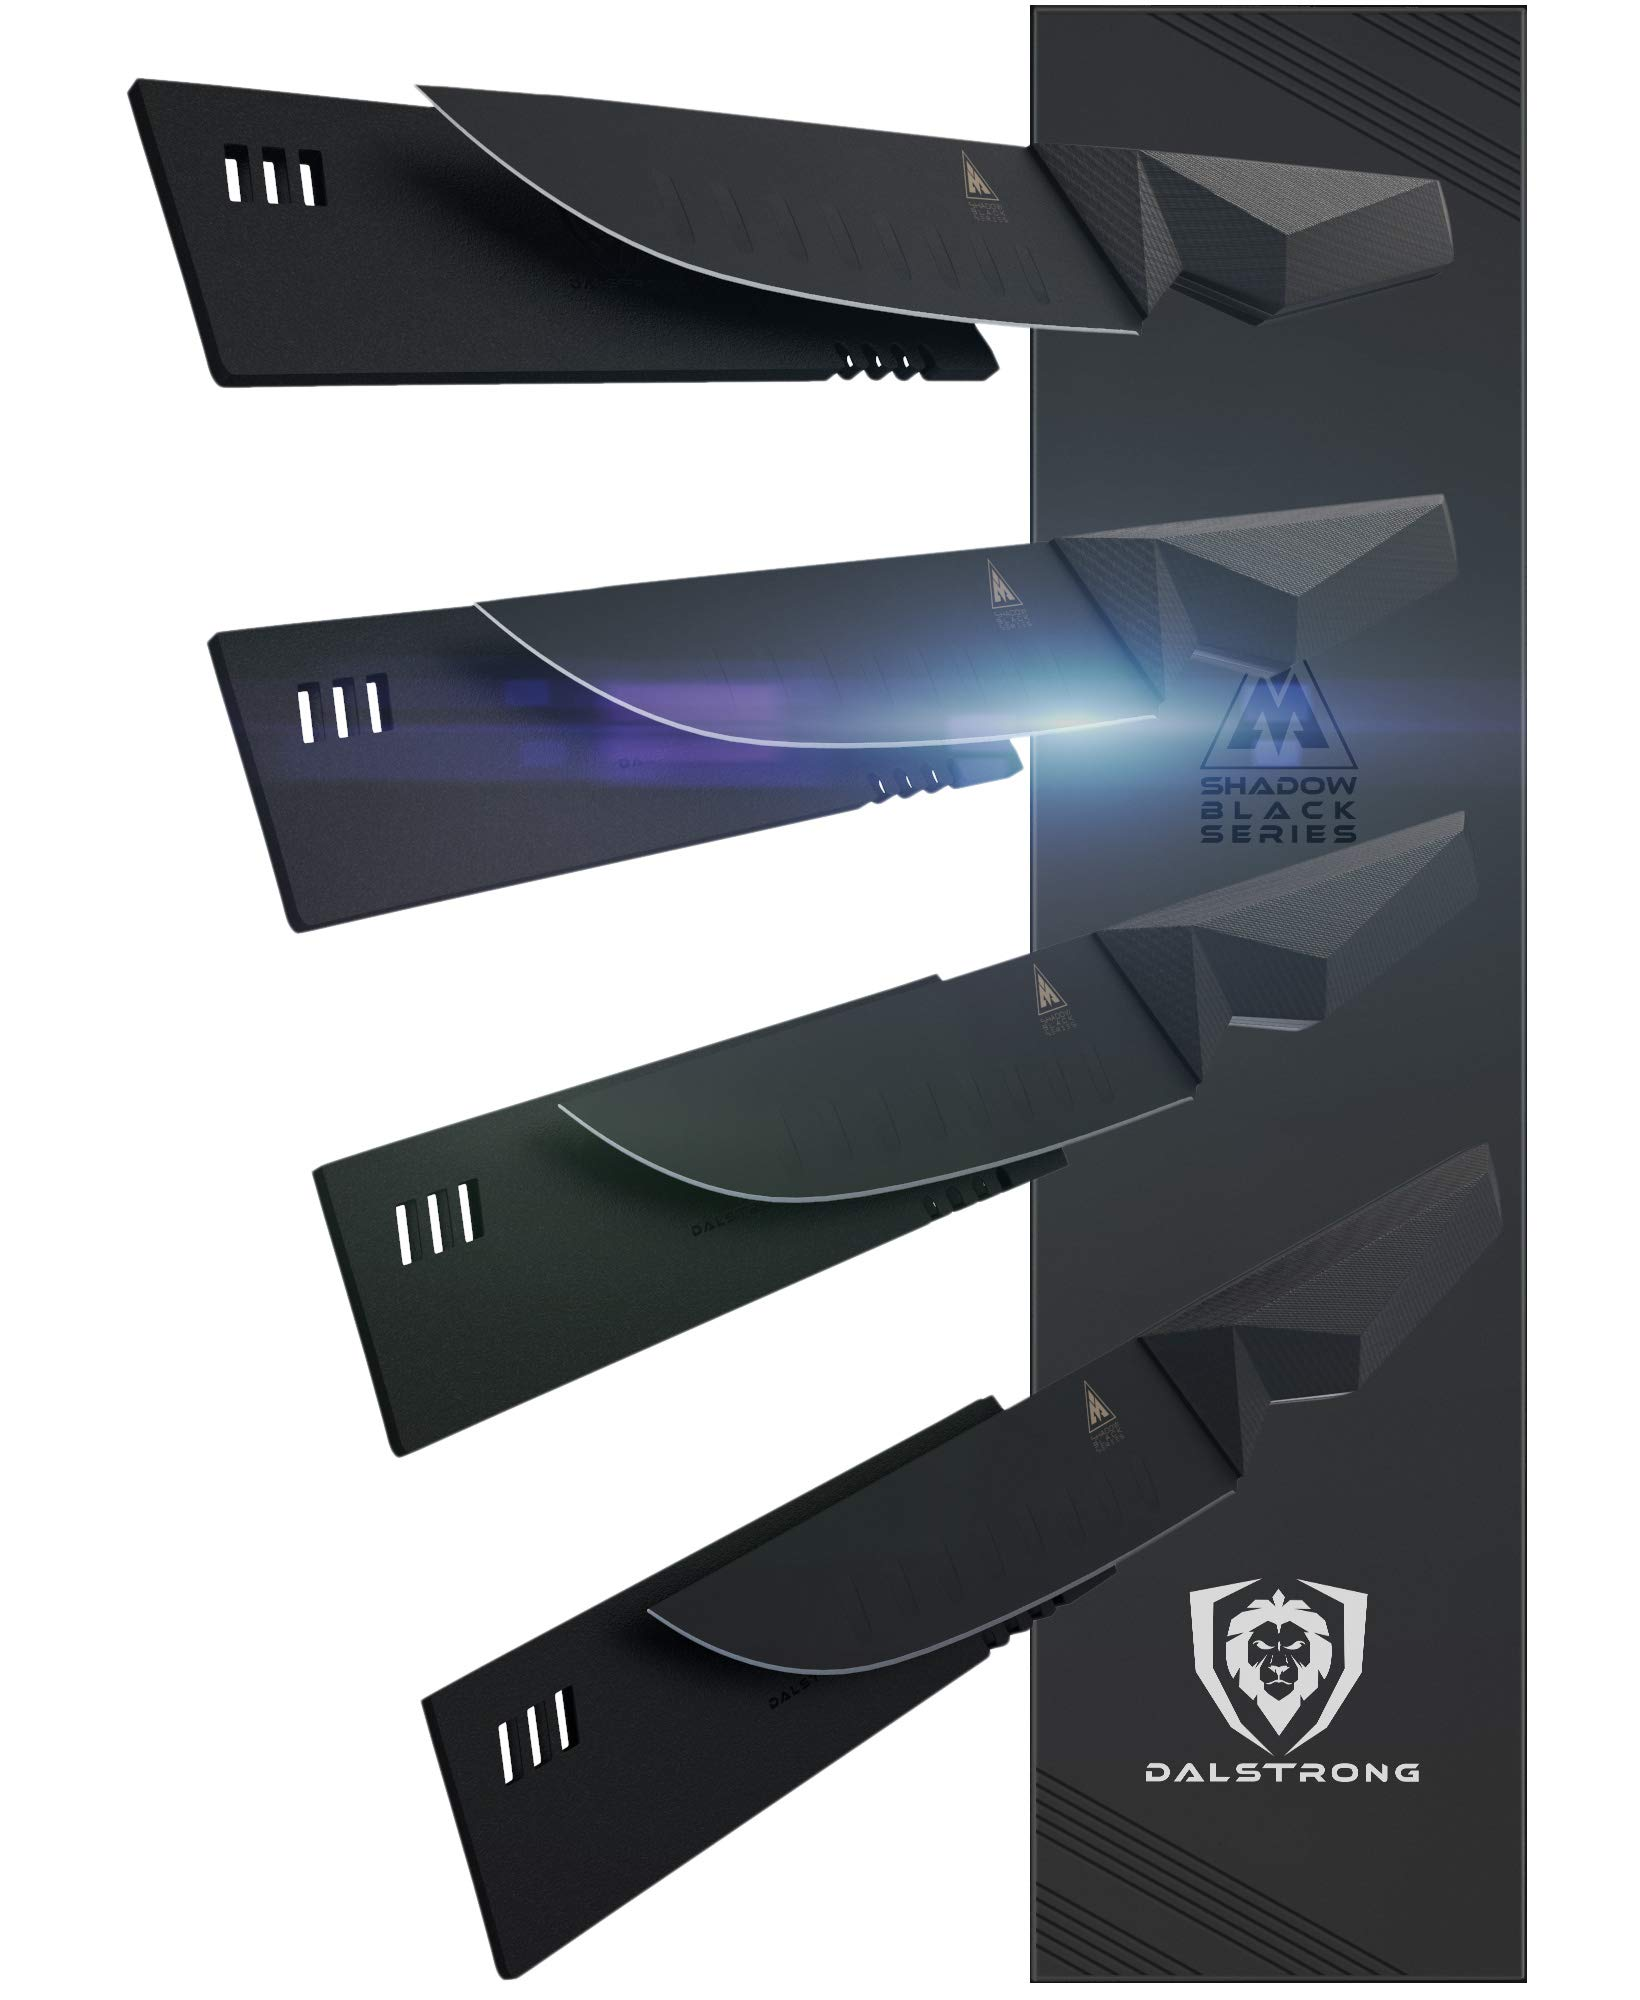 Dalstrong - Shadow Black Series - Black Titanium Nitride Coated German HC Steel - Sheath (5'' Steak Knife Set)